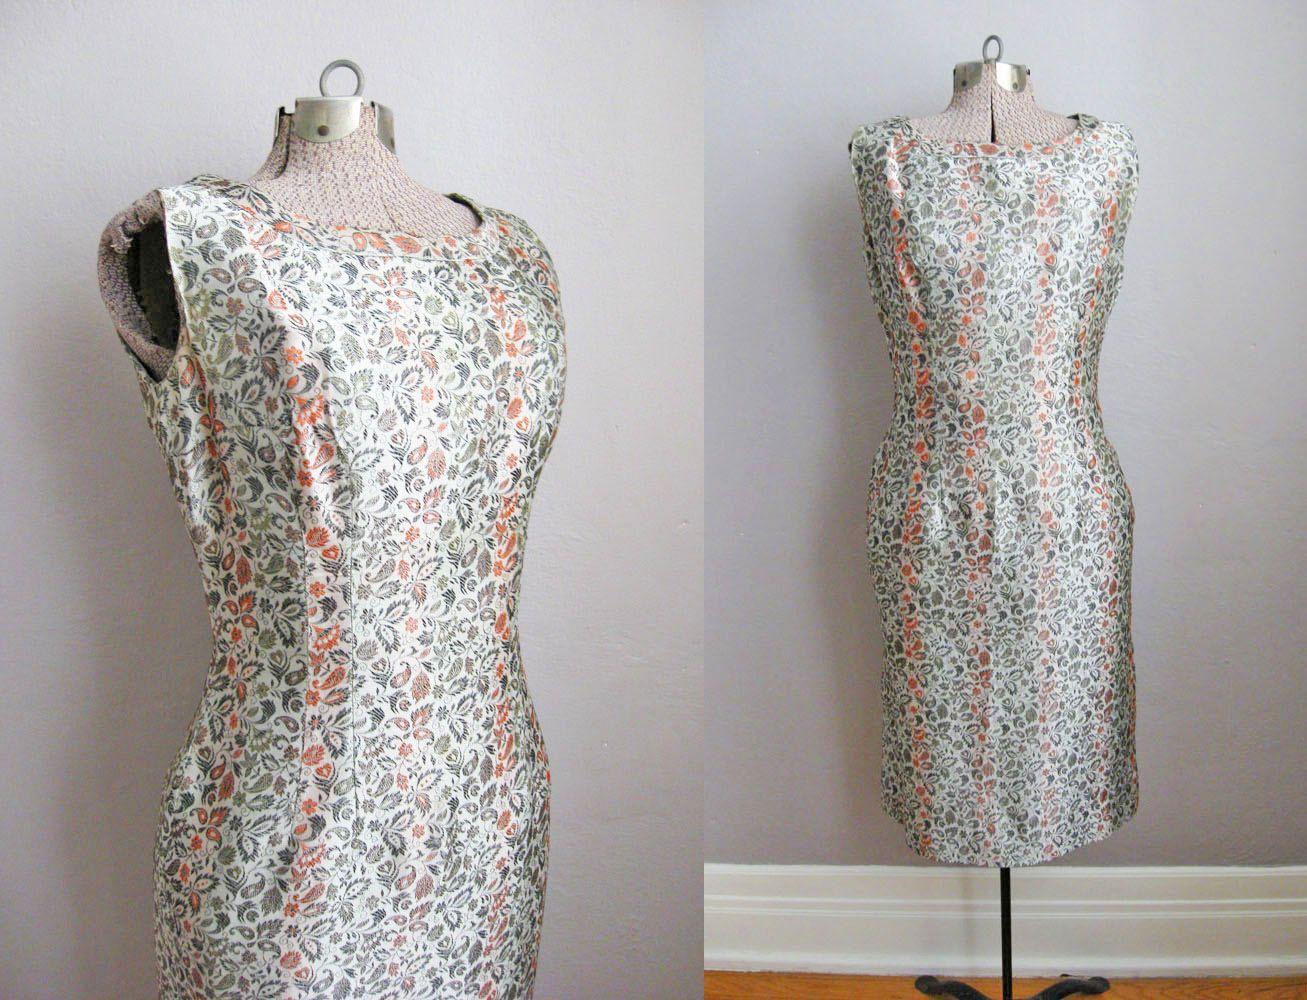 1950s Dress Asian Brocade Green Orange Floral / Vintage 50s Sheath Dress / Small Medium by SoubretteVintage on Etsy